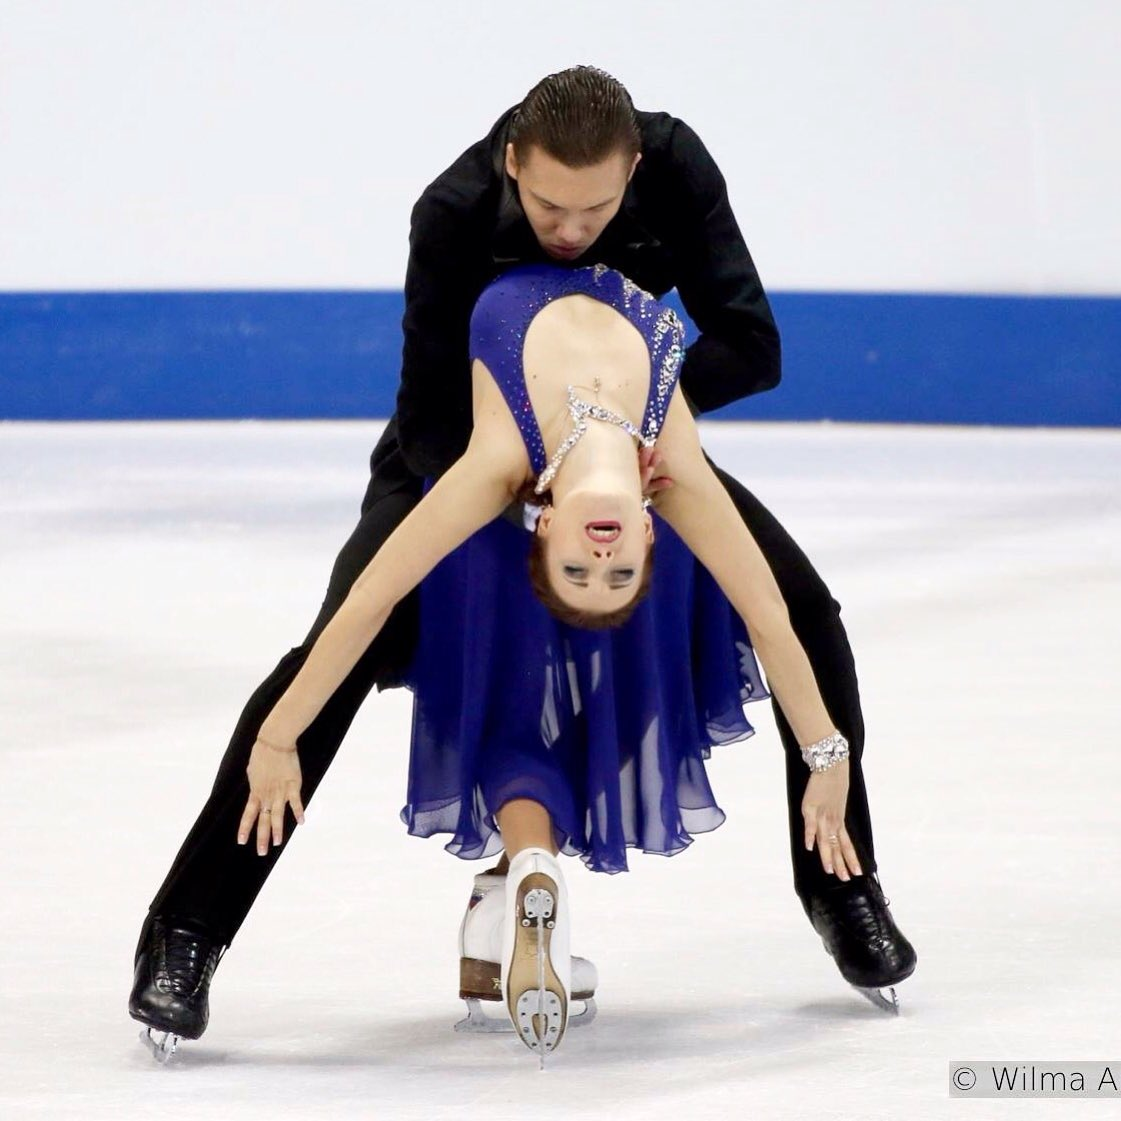 ekaterina bobrova - photo #29